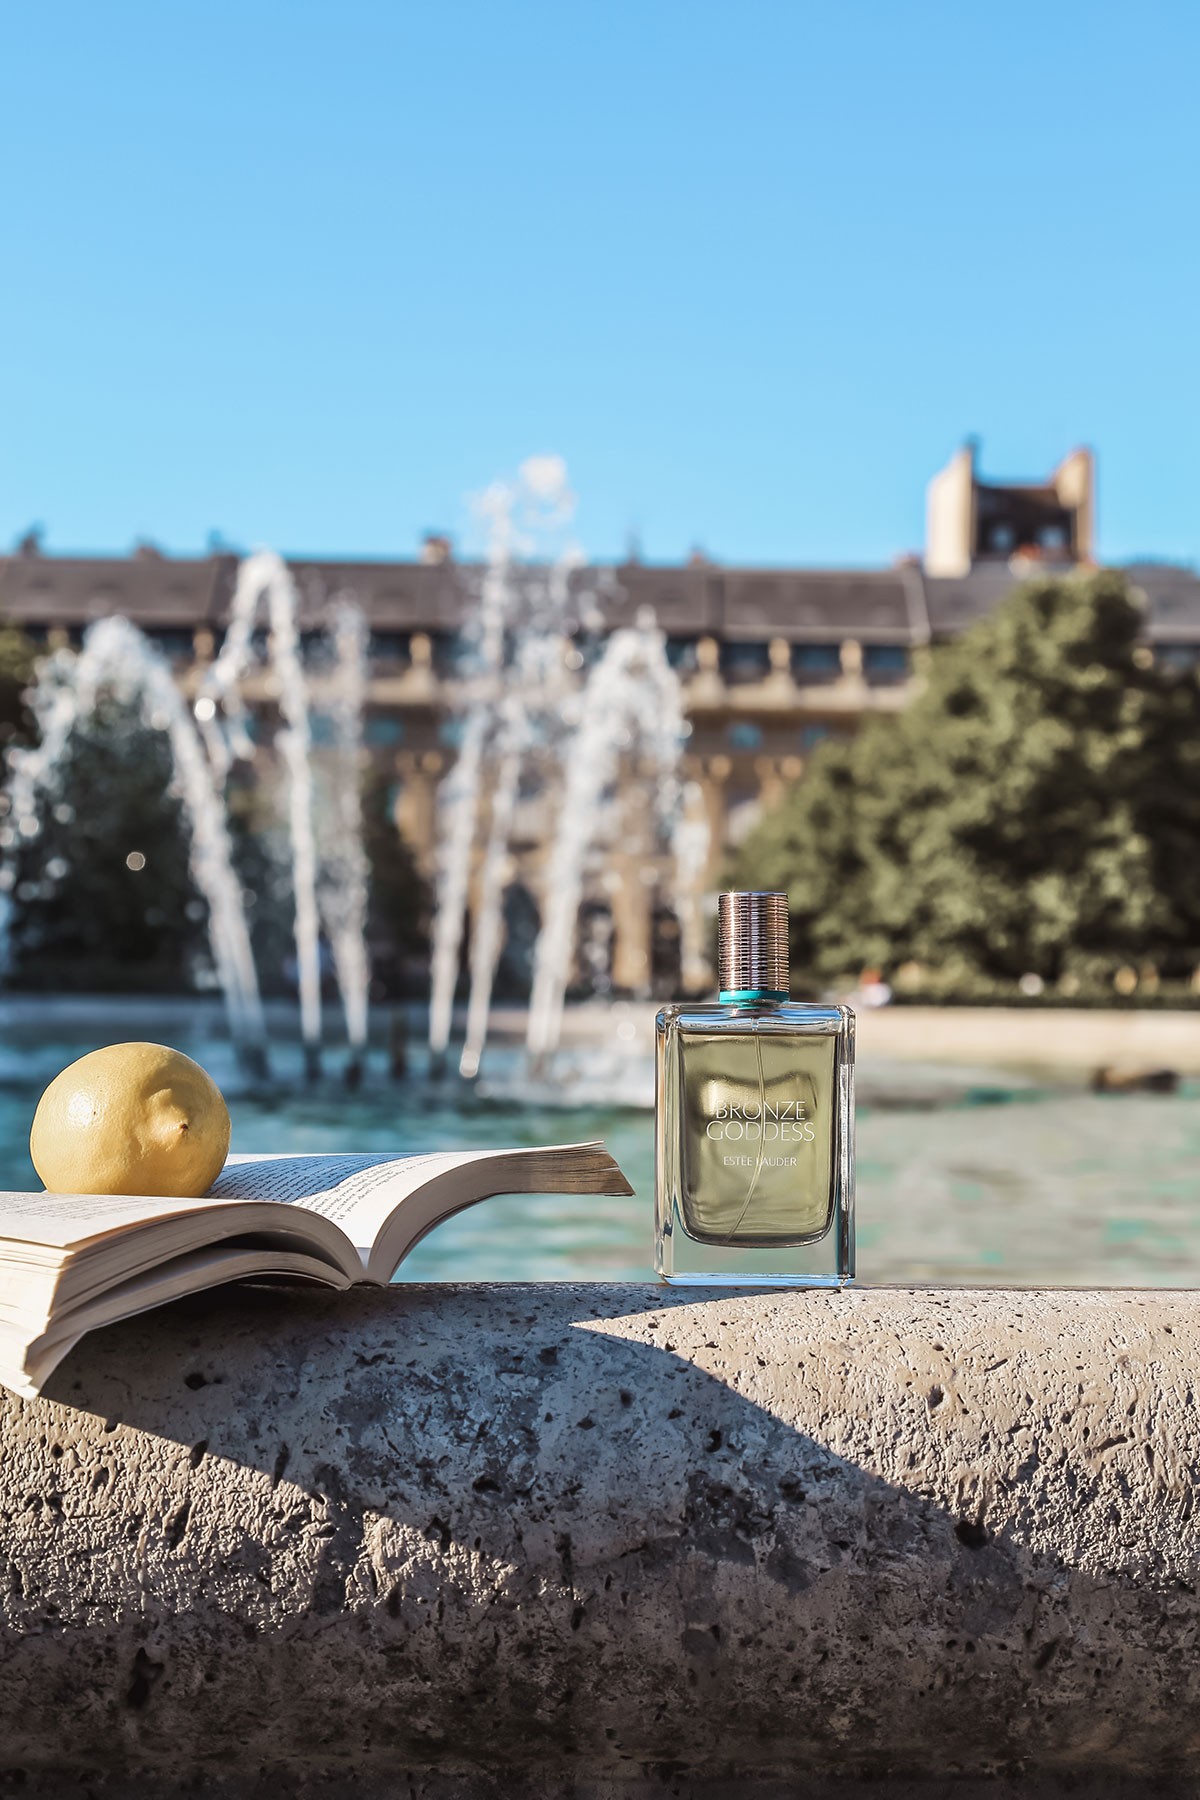 Estée Lauder Bronze Goddess perfume fragrance